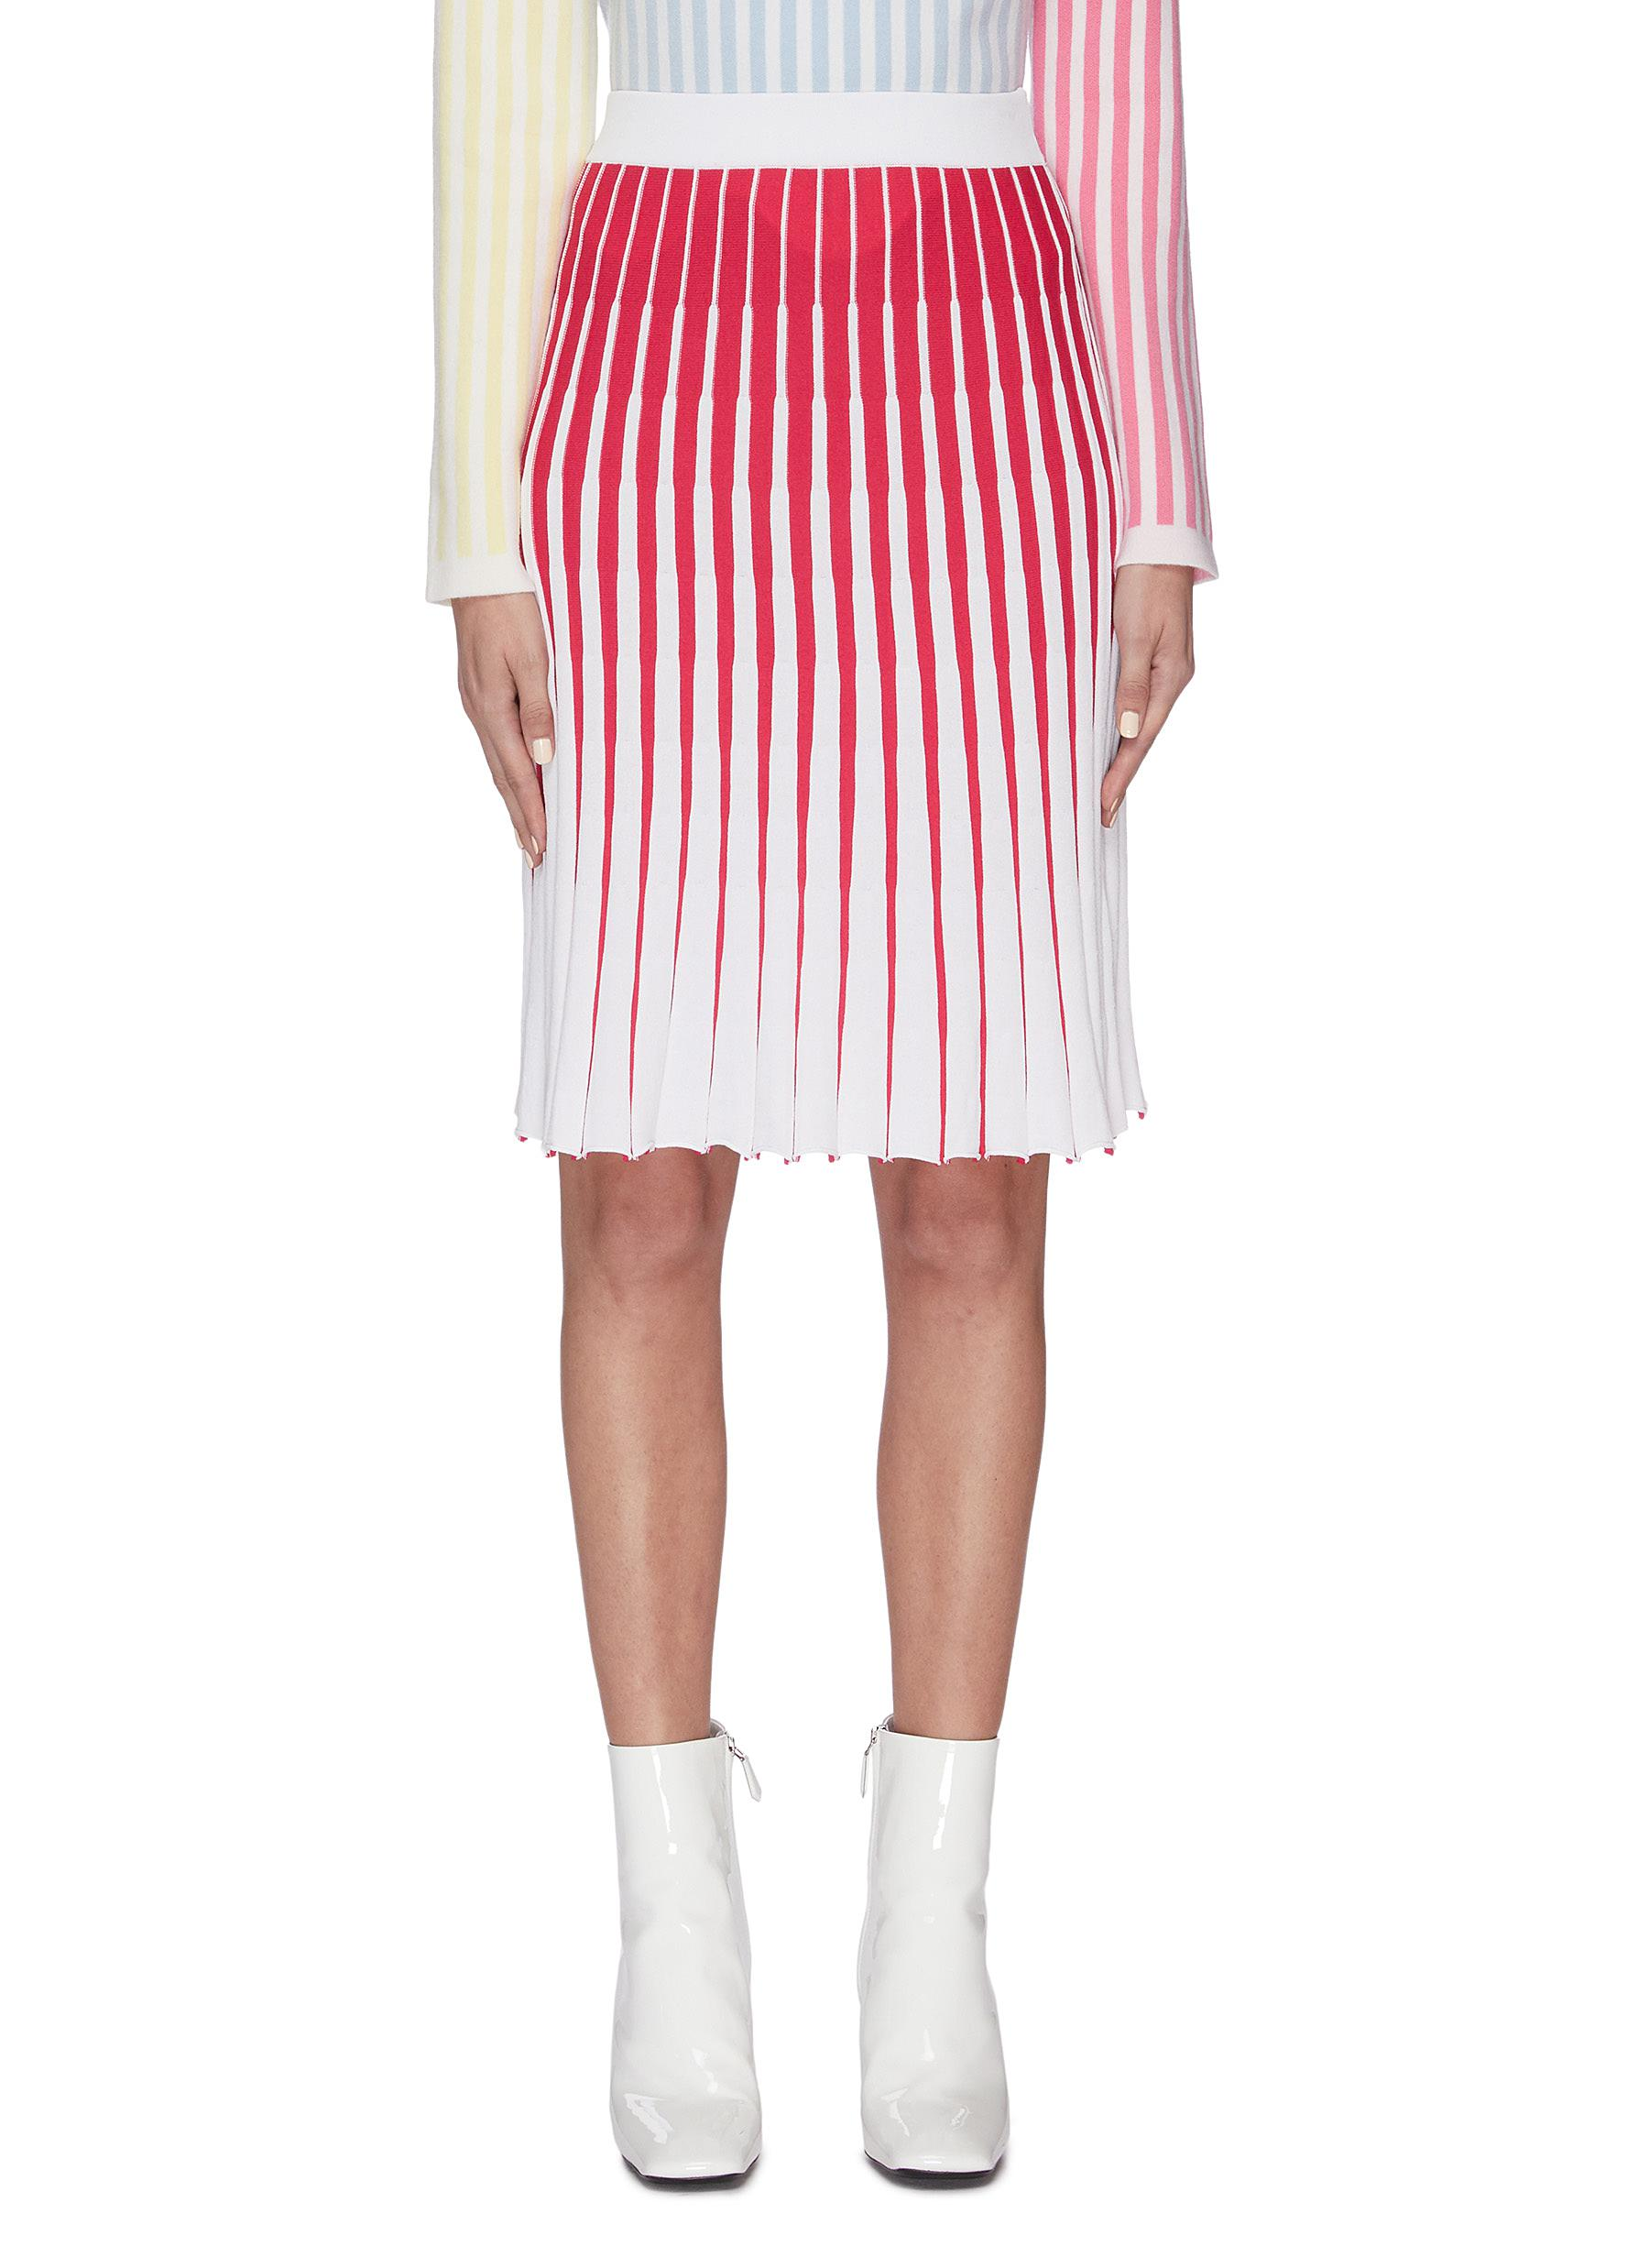 shop Ph5 'Thoms' gradient colourblock ribbed midi skirt online